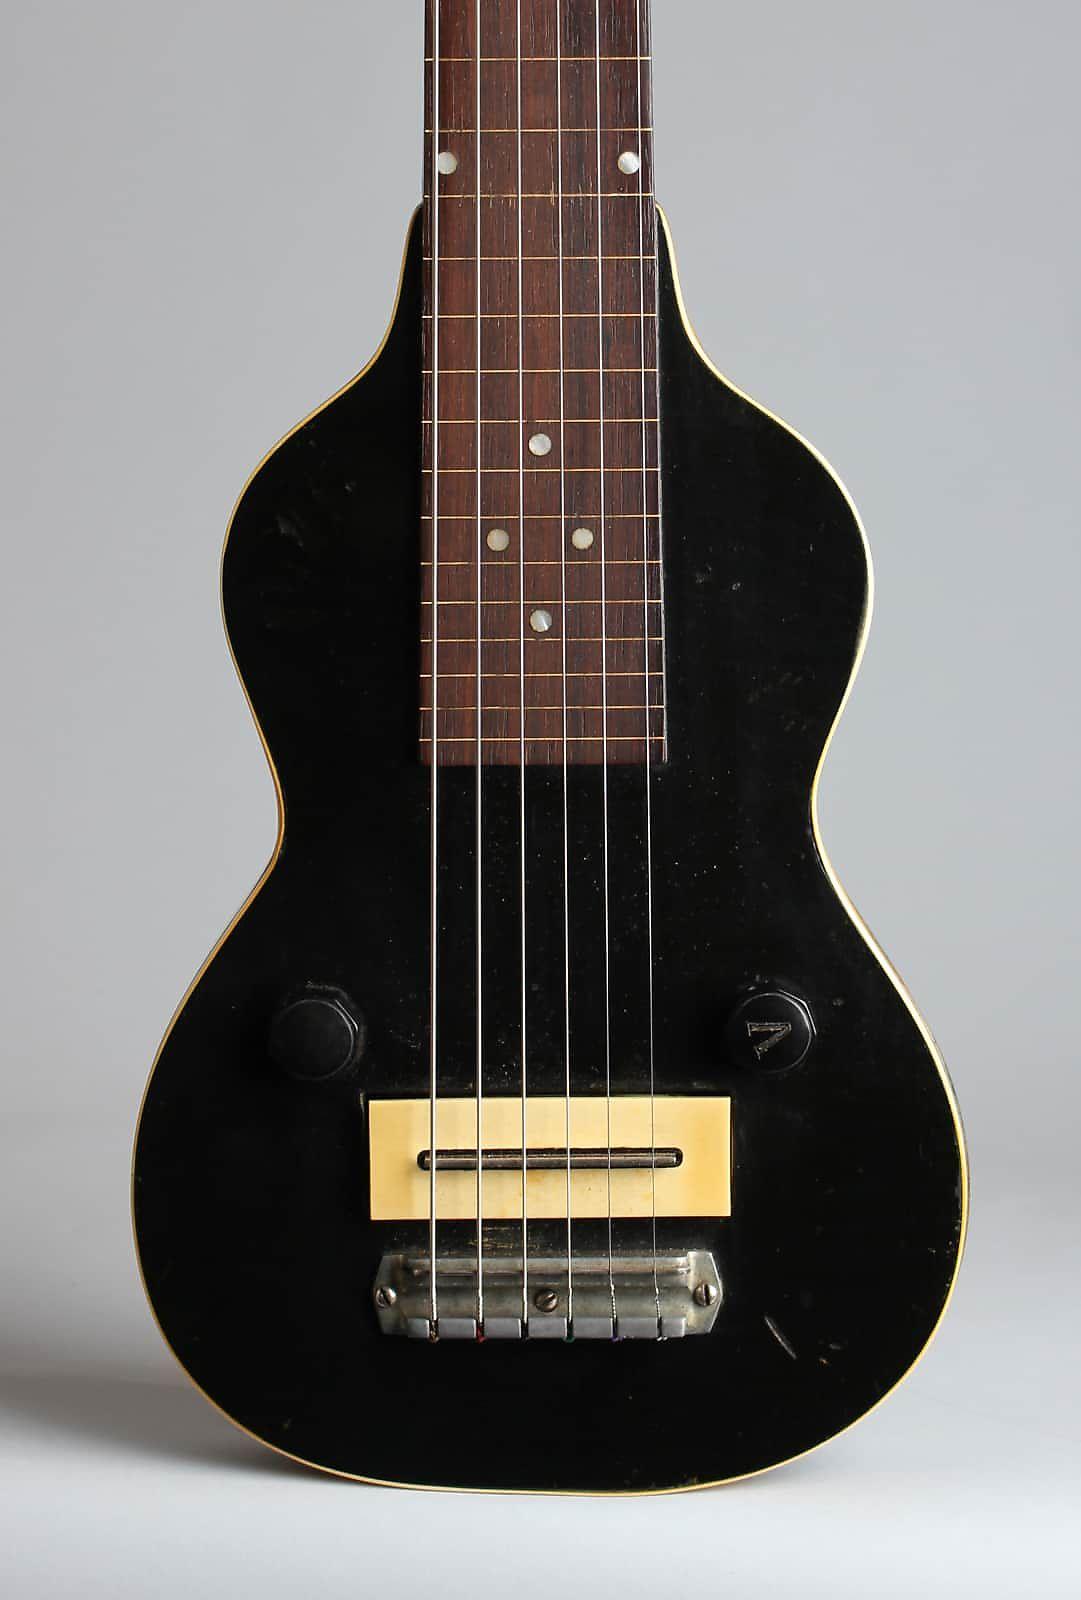 Gibson  EH-100 Lap Steel Electric Guitar (1937), ser. #1318-9, original black hard shell case.